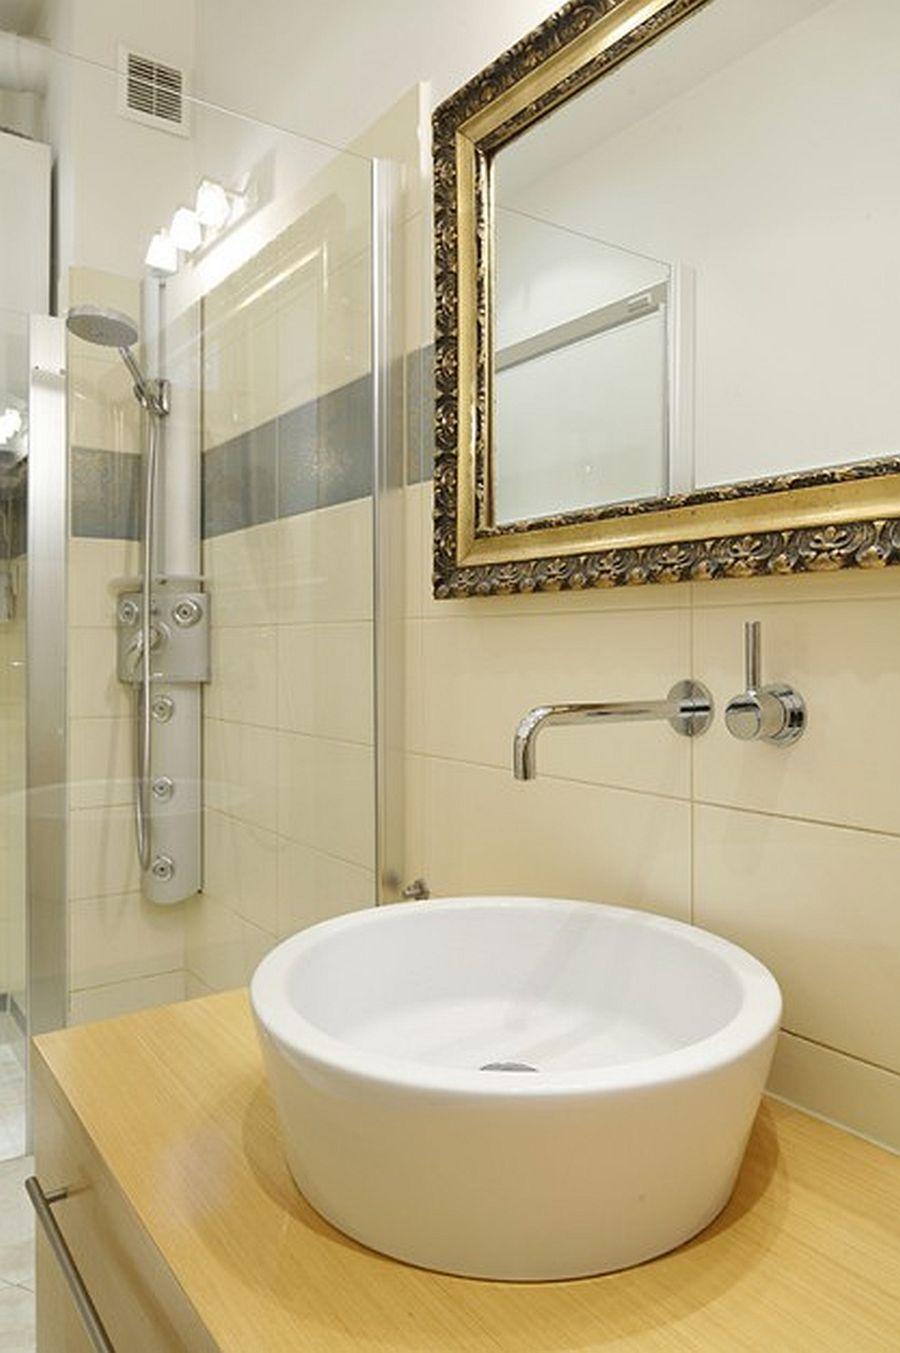 adelaparvu.com despre casa moderna cu piese de mobila clasice, Foto Urzadzamy (14)